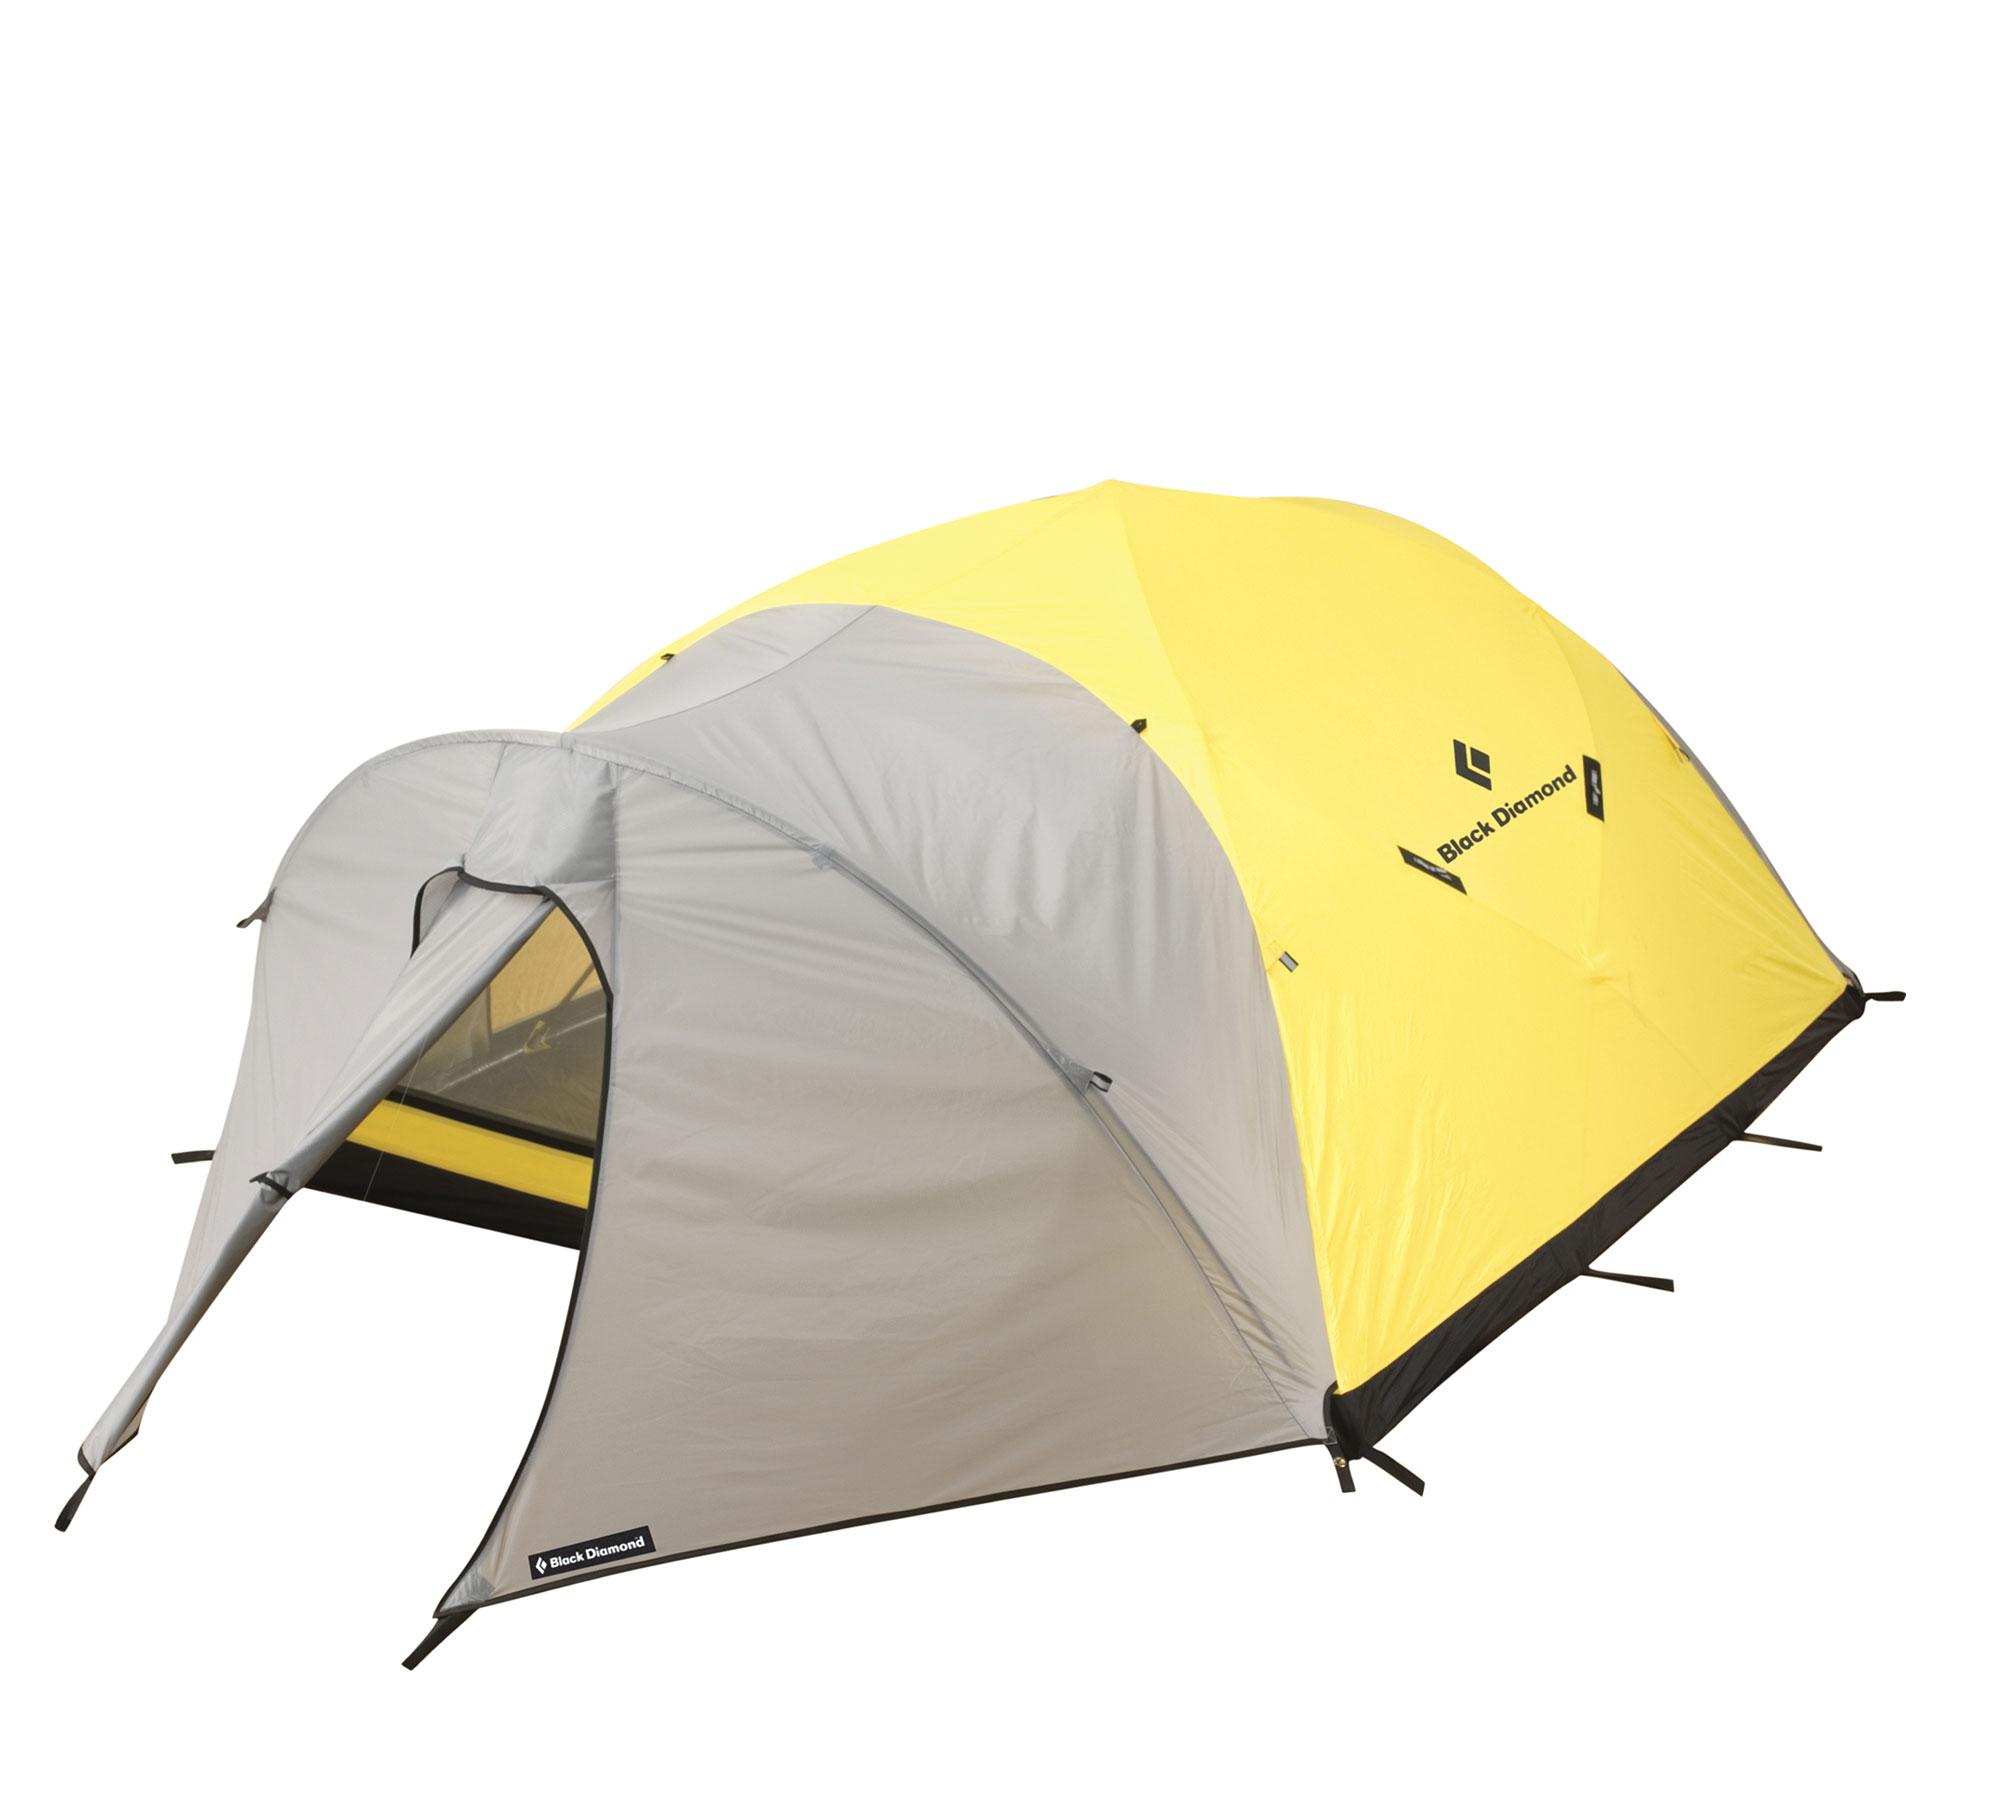 Bombshelter Tent - Black Diamond Hiking/Trekking Gear